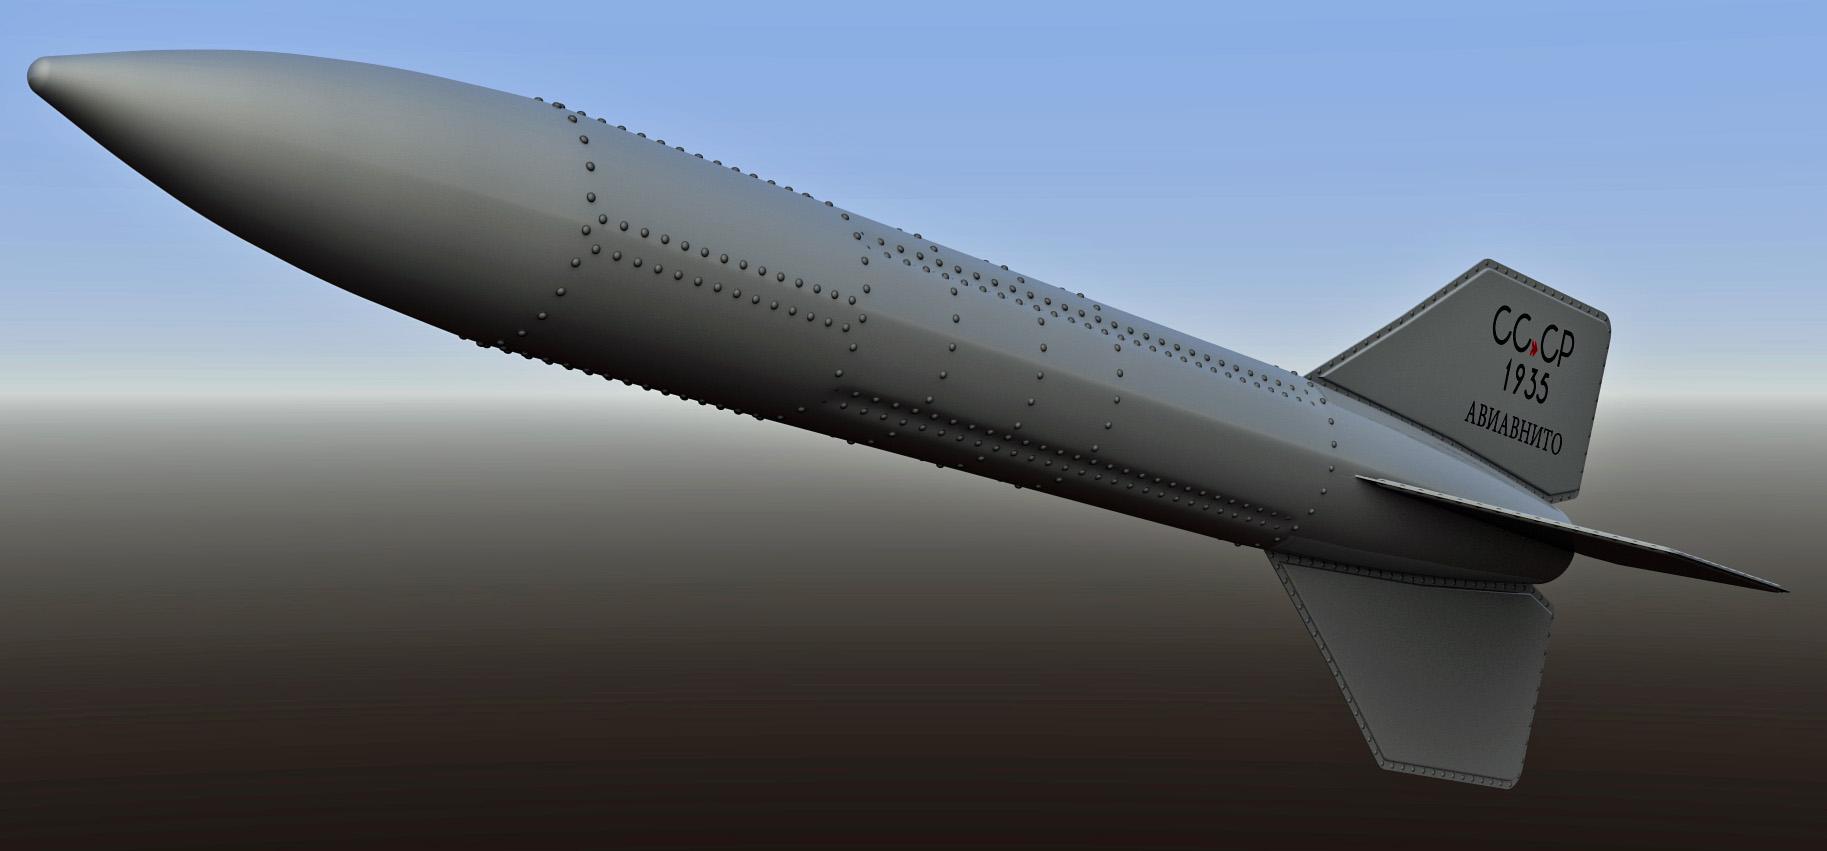 Aviaveento, historical Soviet rocket.